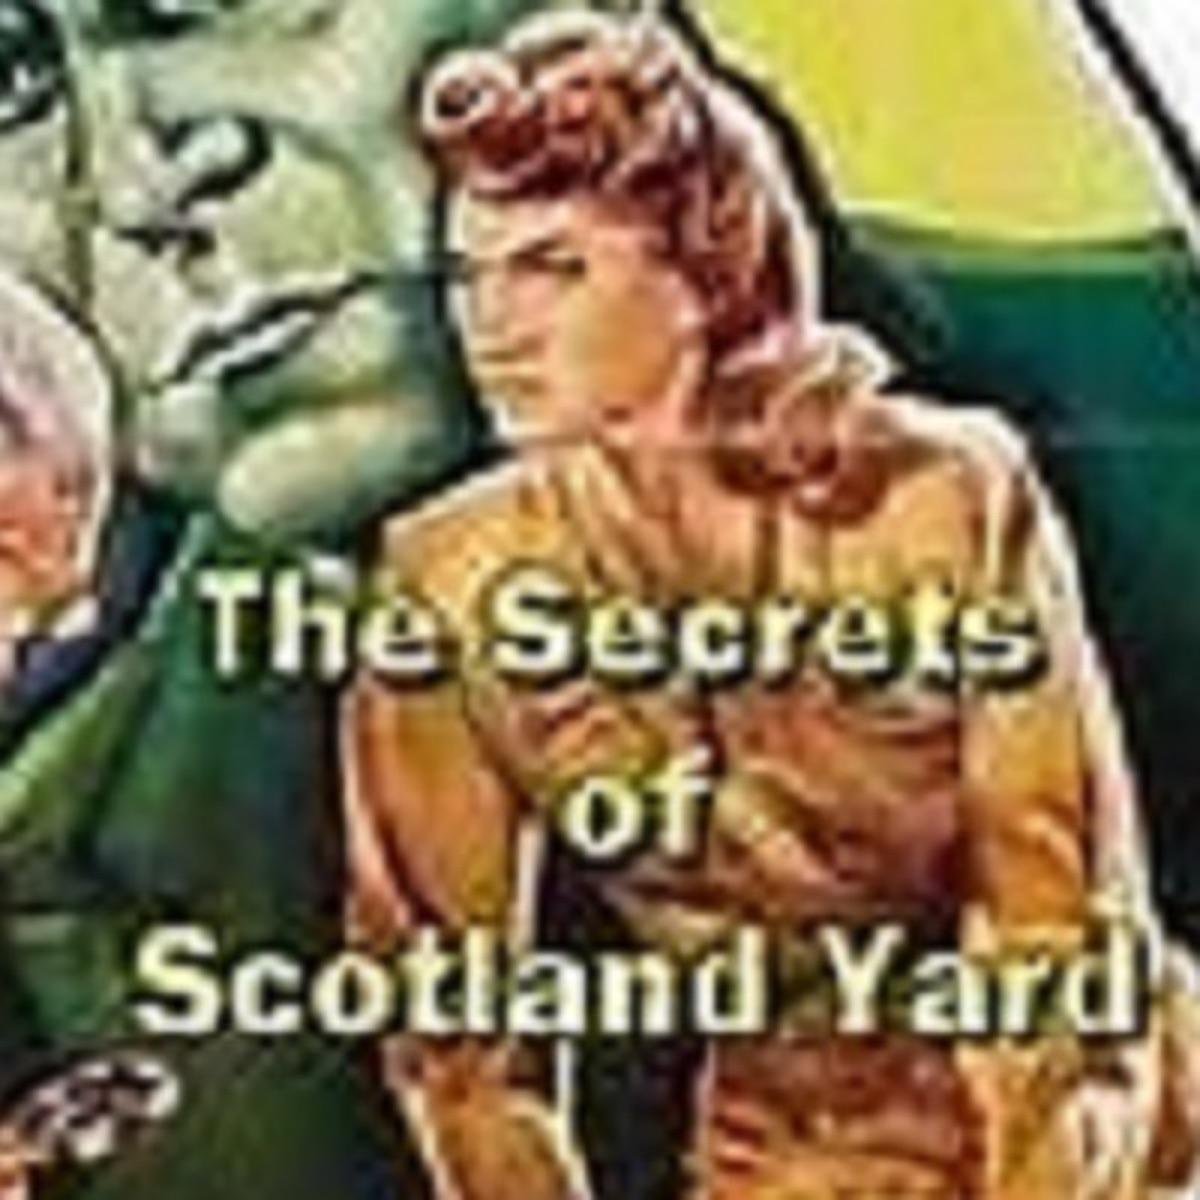 The Secrets of Scotland Yard